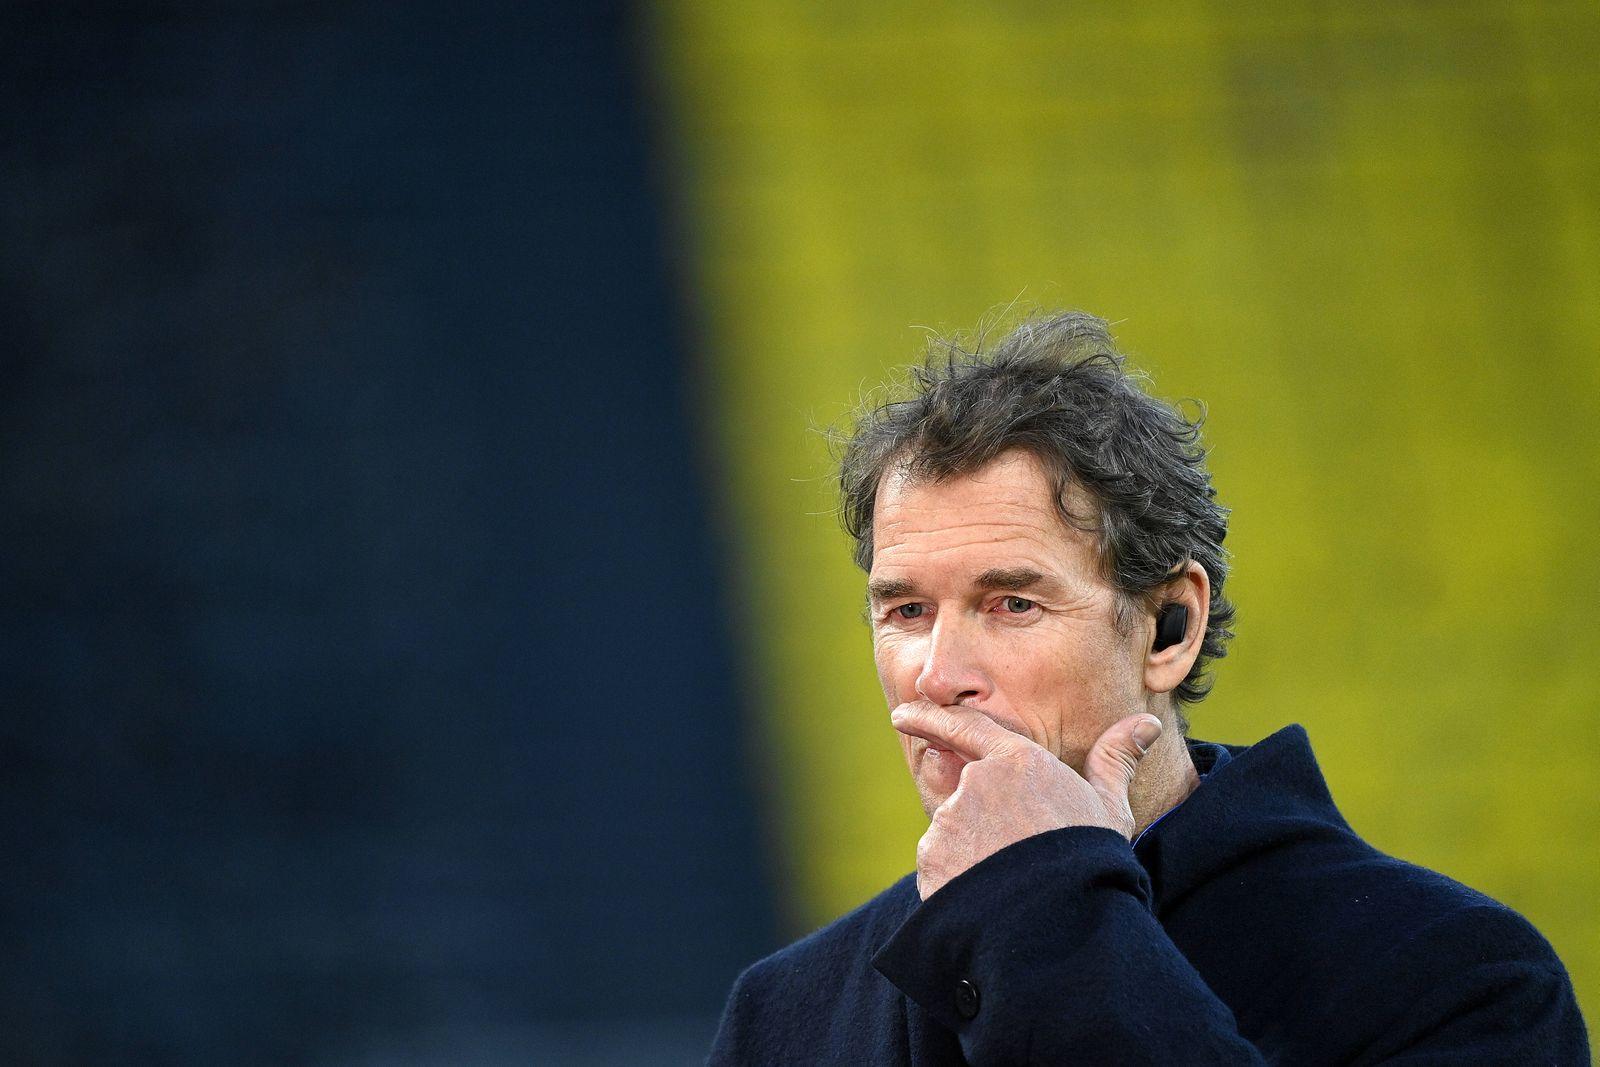 Dortmund, Signal Iduna Park, 14.04.21, GER, Herren, UEFA Champions League, Saison 2020-2021, Borussia Dortmund - Manches